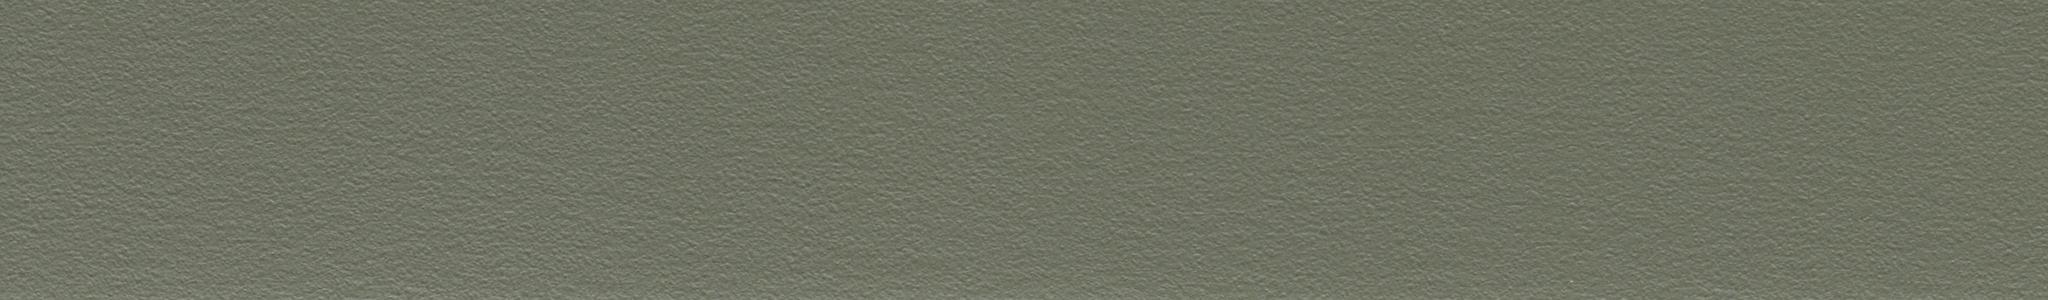 HU 166736 ABS Edge Green Soft Pearl 107